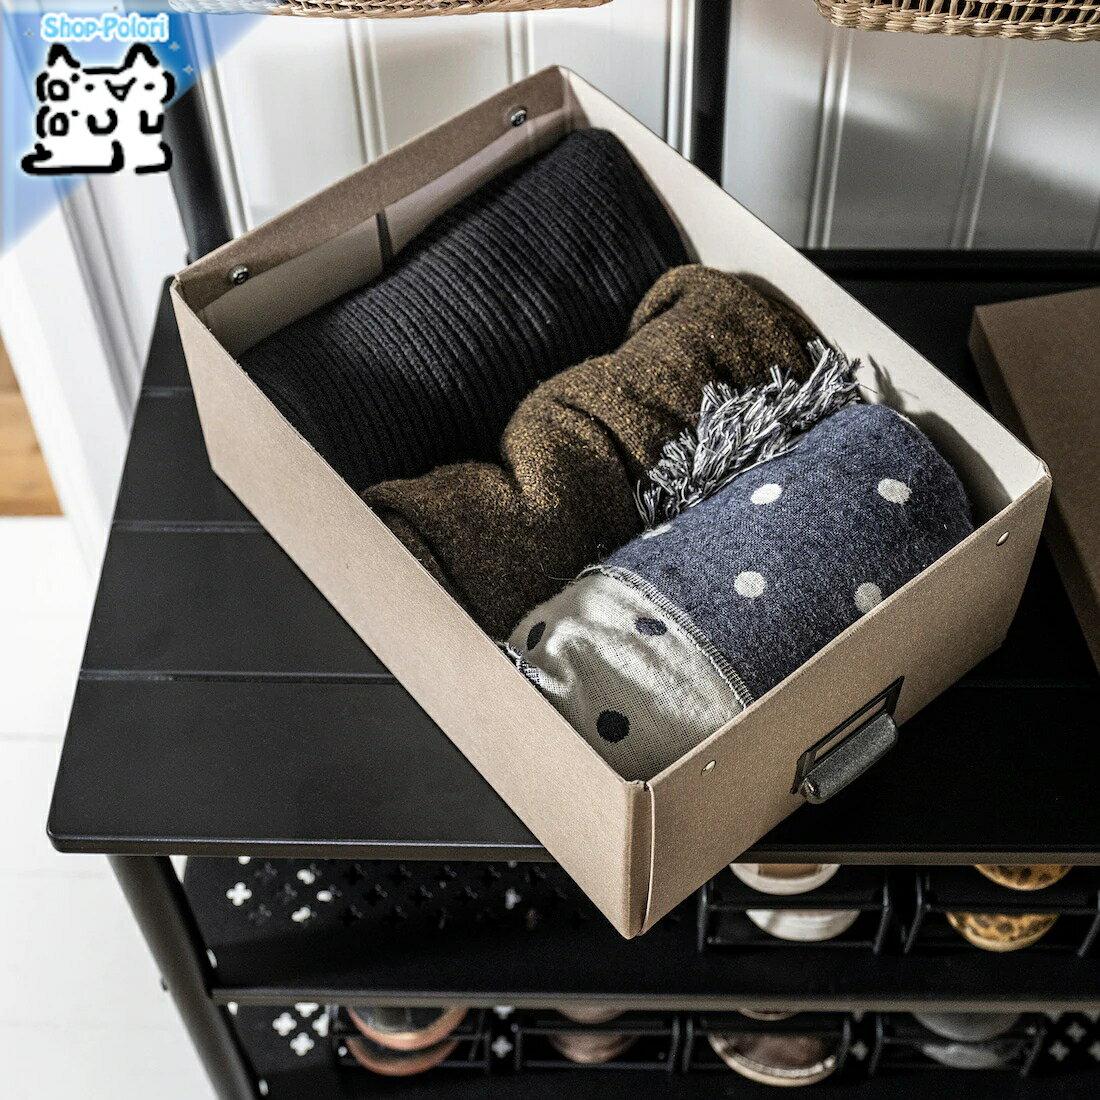 【IKEA Original】TJOG -チョーグ- 収納ボックス ふた付き ダークベージュ 25x36x15 cm